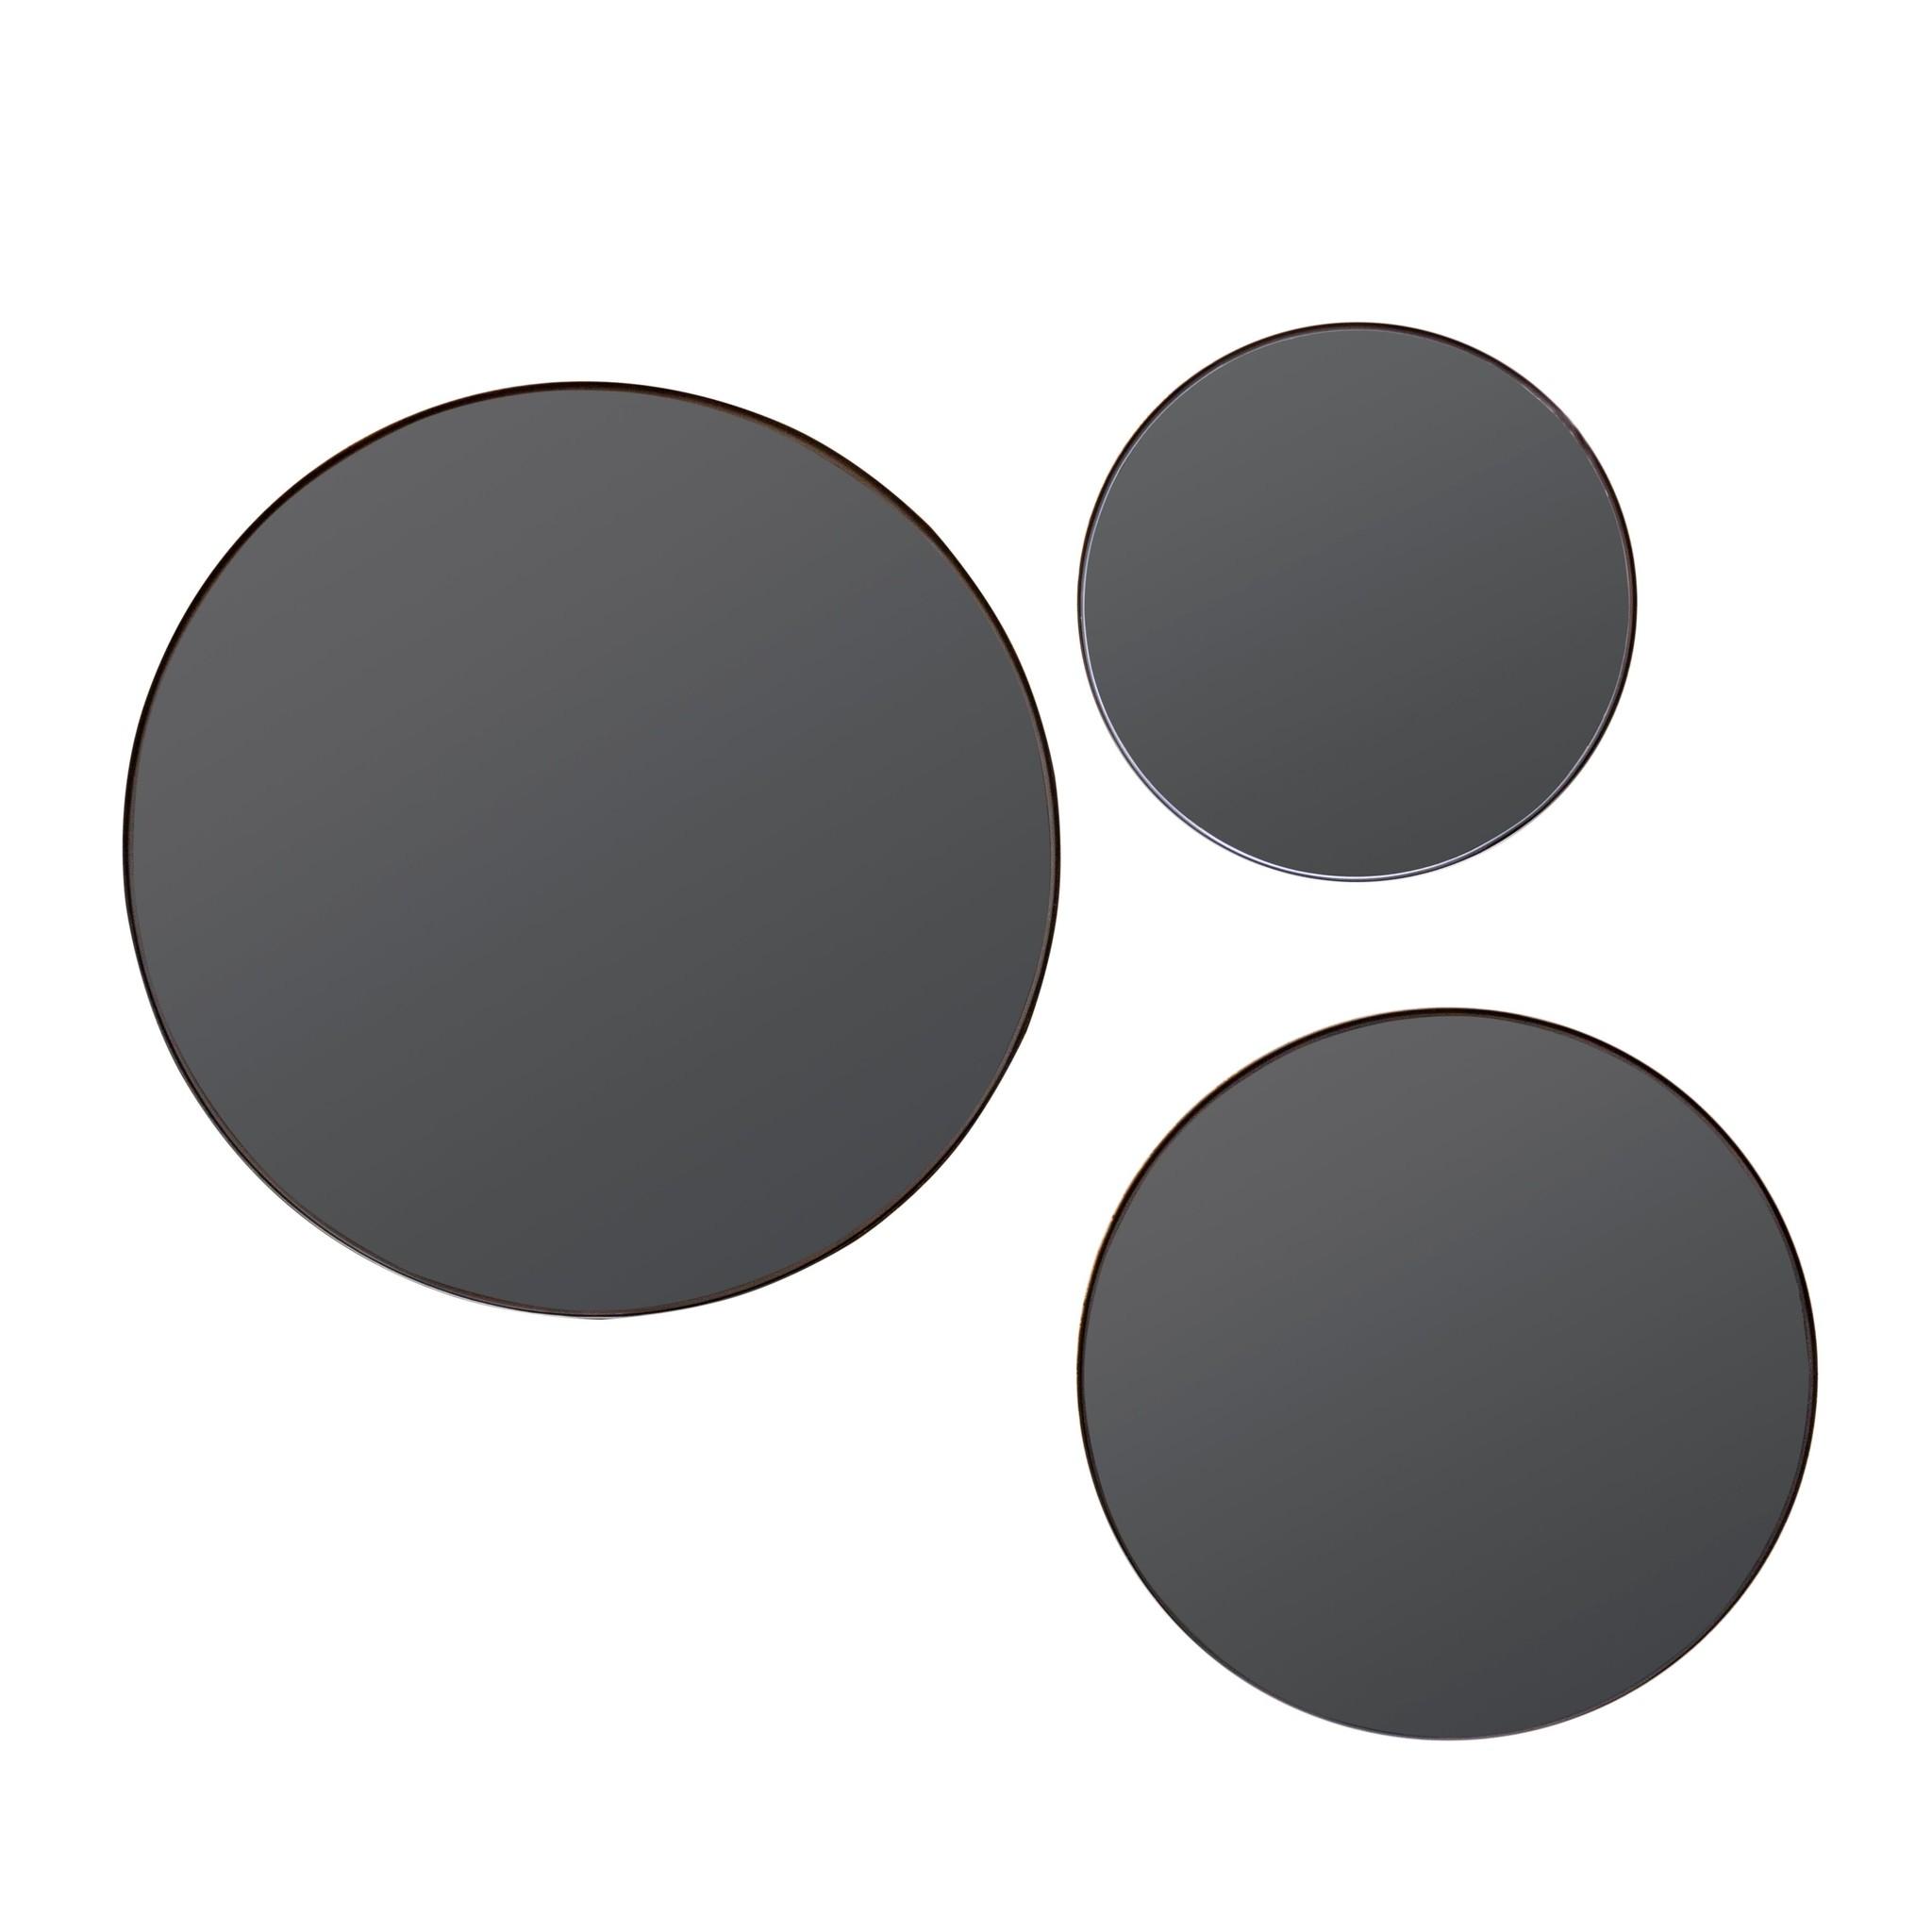 Goede Ronde spiegel set van 3 - Zwart - Wilhelmina Designs QS-04